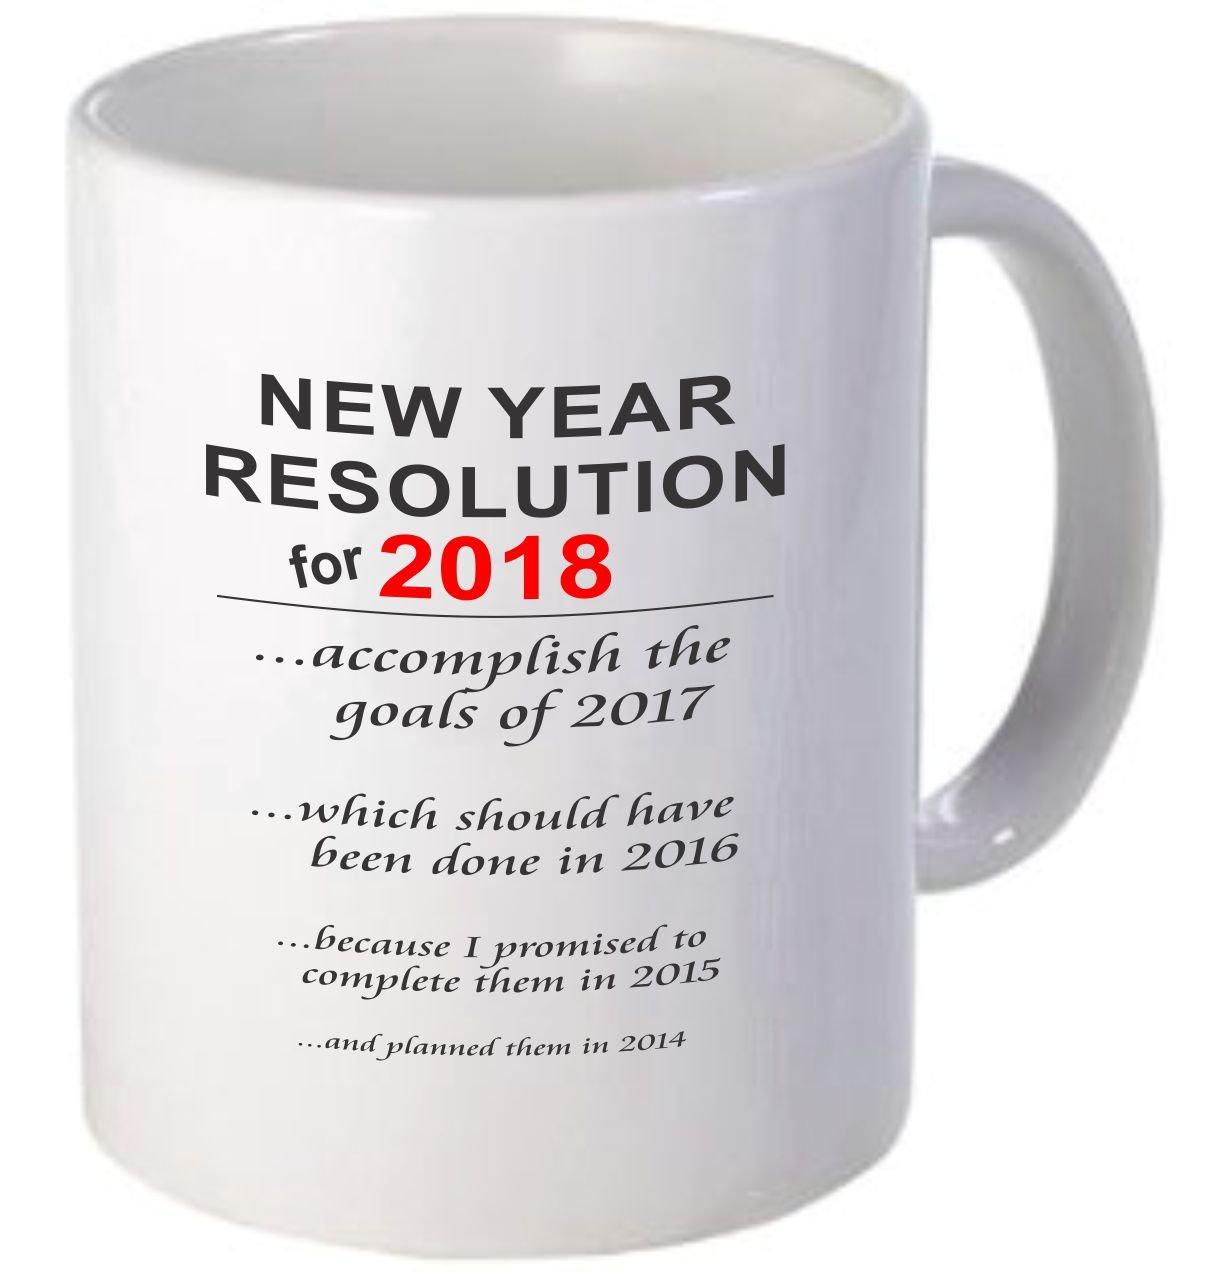 Rikki Knight新しい年解像度 – 新しい年目標2018 – 面白い引用デザイン11オンスセラミックコーヒーマグカップ White DIS-mugs-WHITE-4406 B078QWZ33H  NewYearGoals White